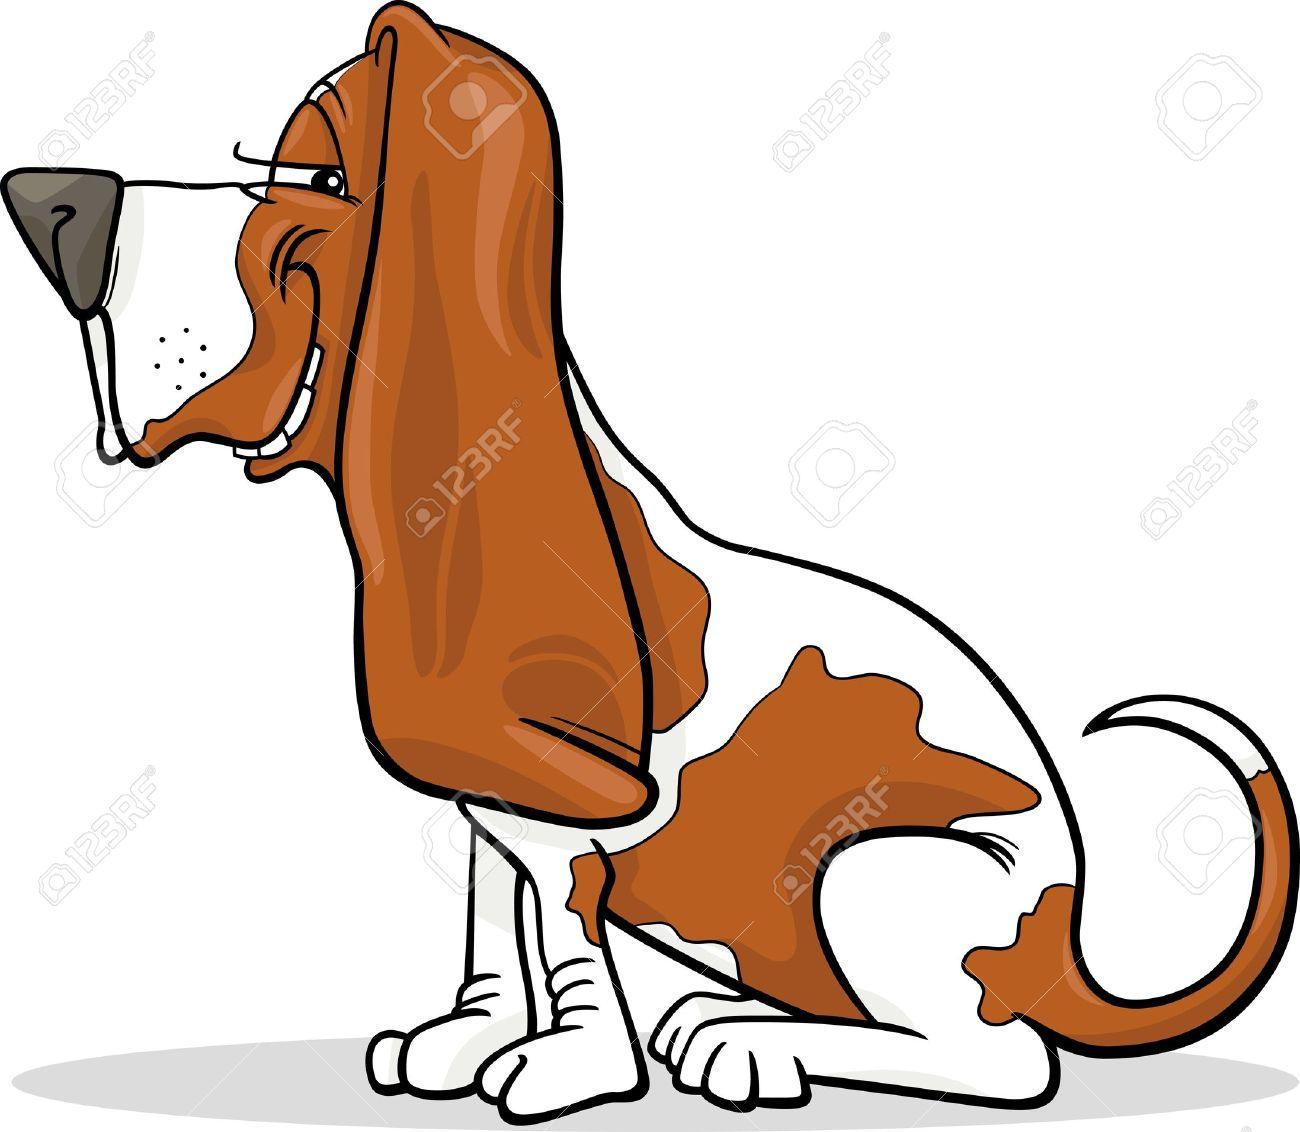 Cartoon Illustration of Funny Purebred Spotted Basset Hound Dog Stock  Vector - 16213938